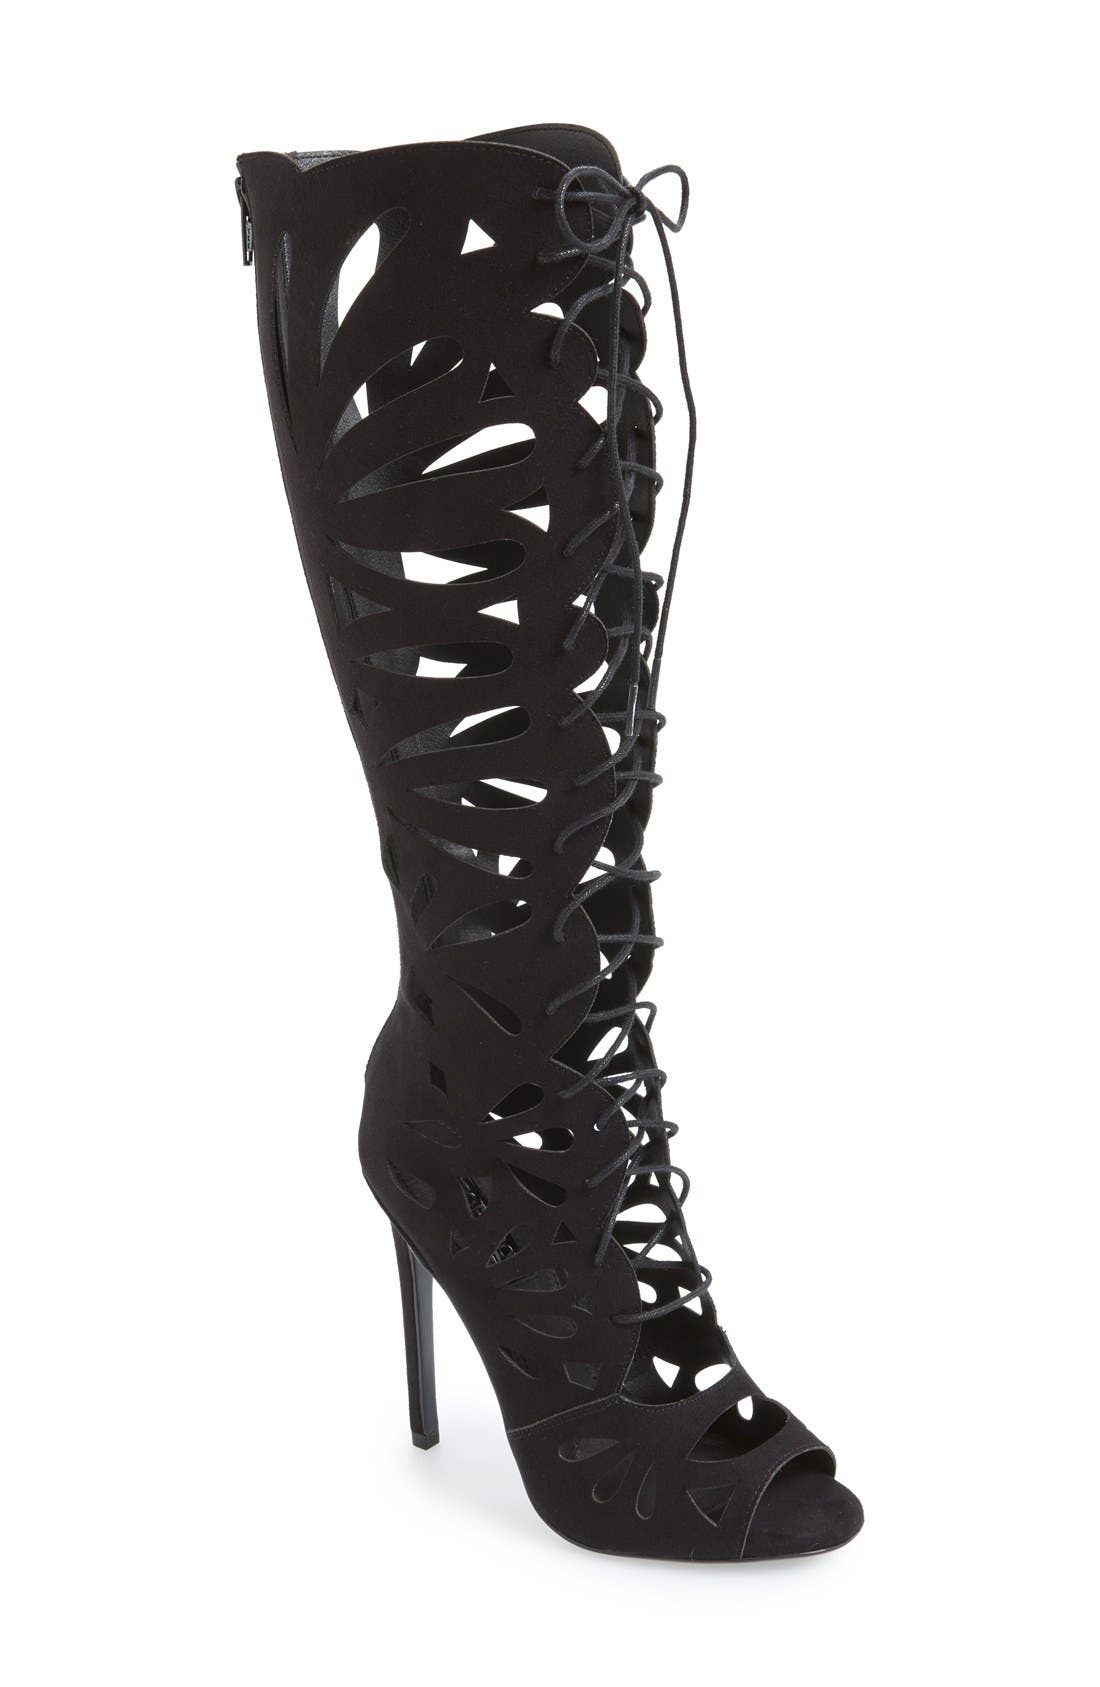 Alternate Image 1 Selected - Topshop 'Ravishing' Cutout Lace-Up Peep Toe Boot (Women)